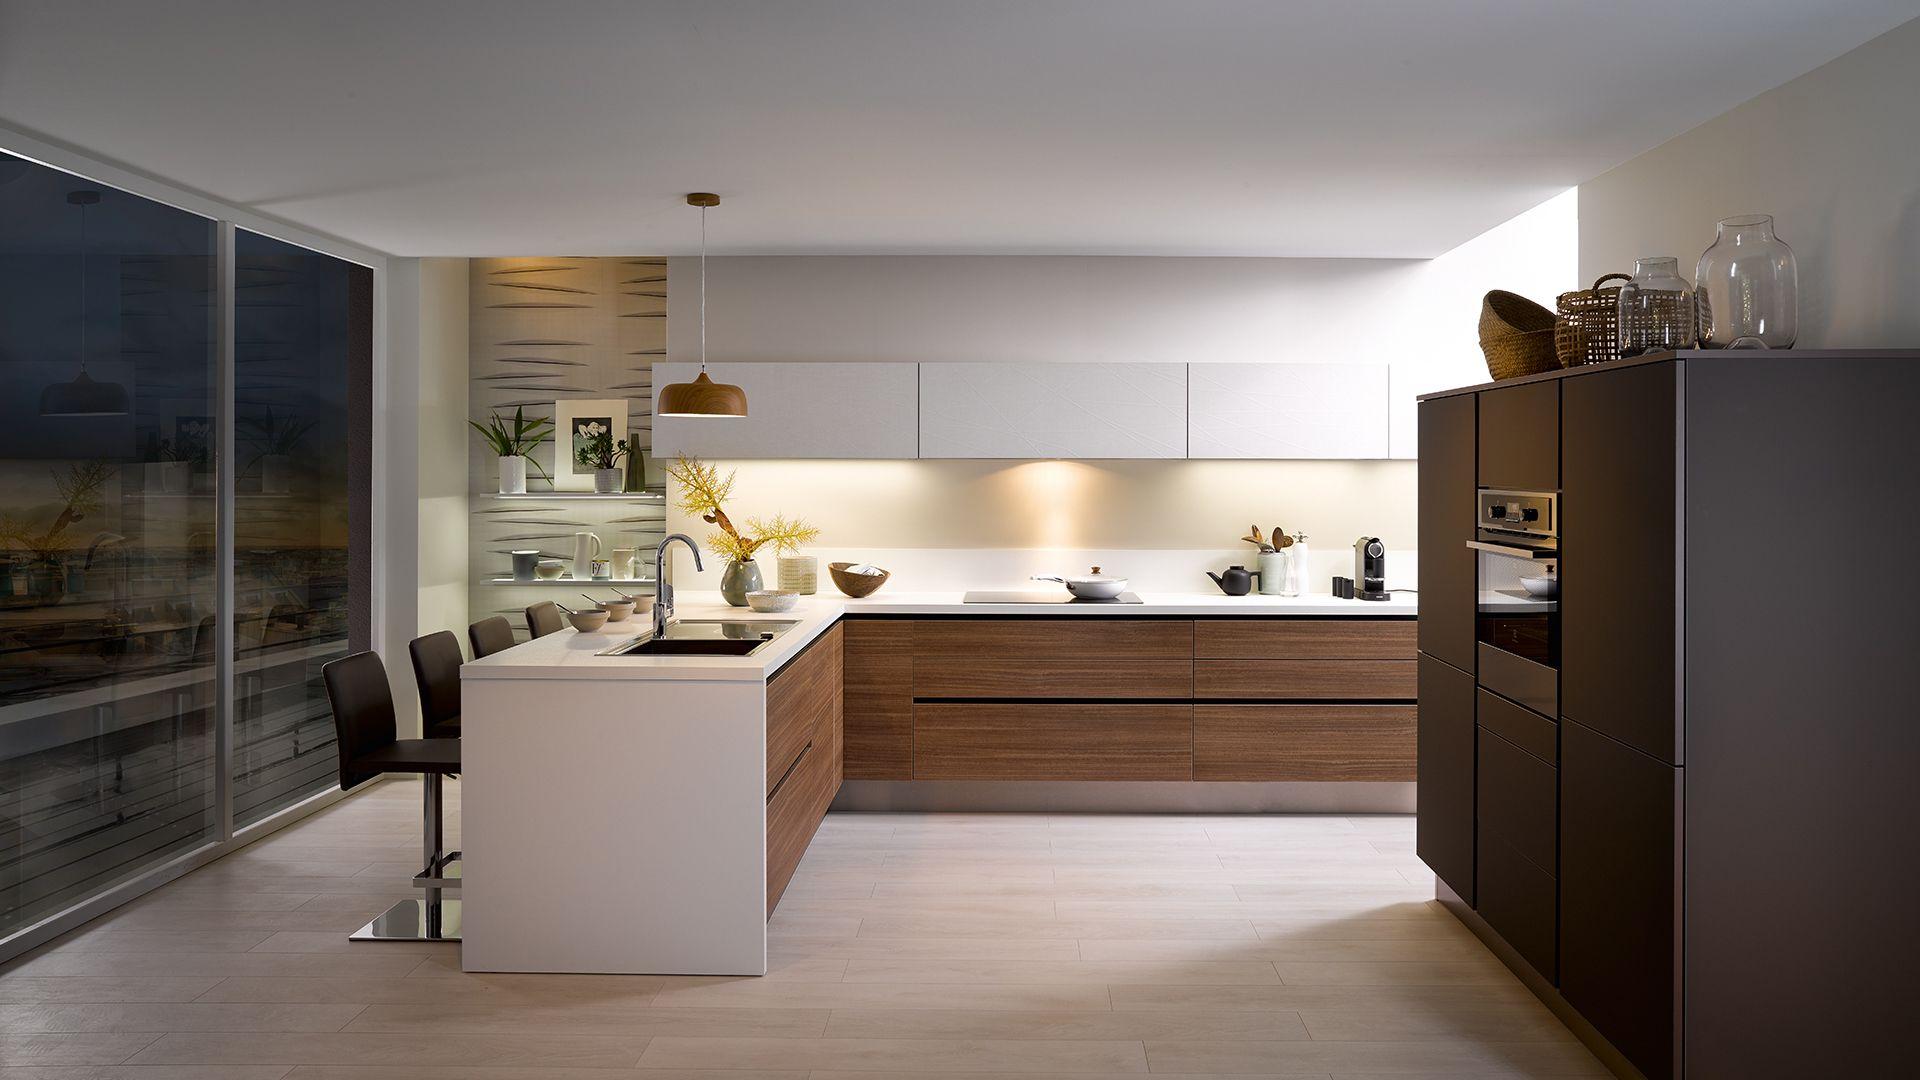 cuisine quip e e label style design bois cuisinella. Black Bedroom Furniture Sets. Home Design Ideas